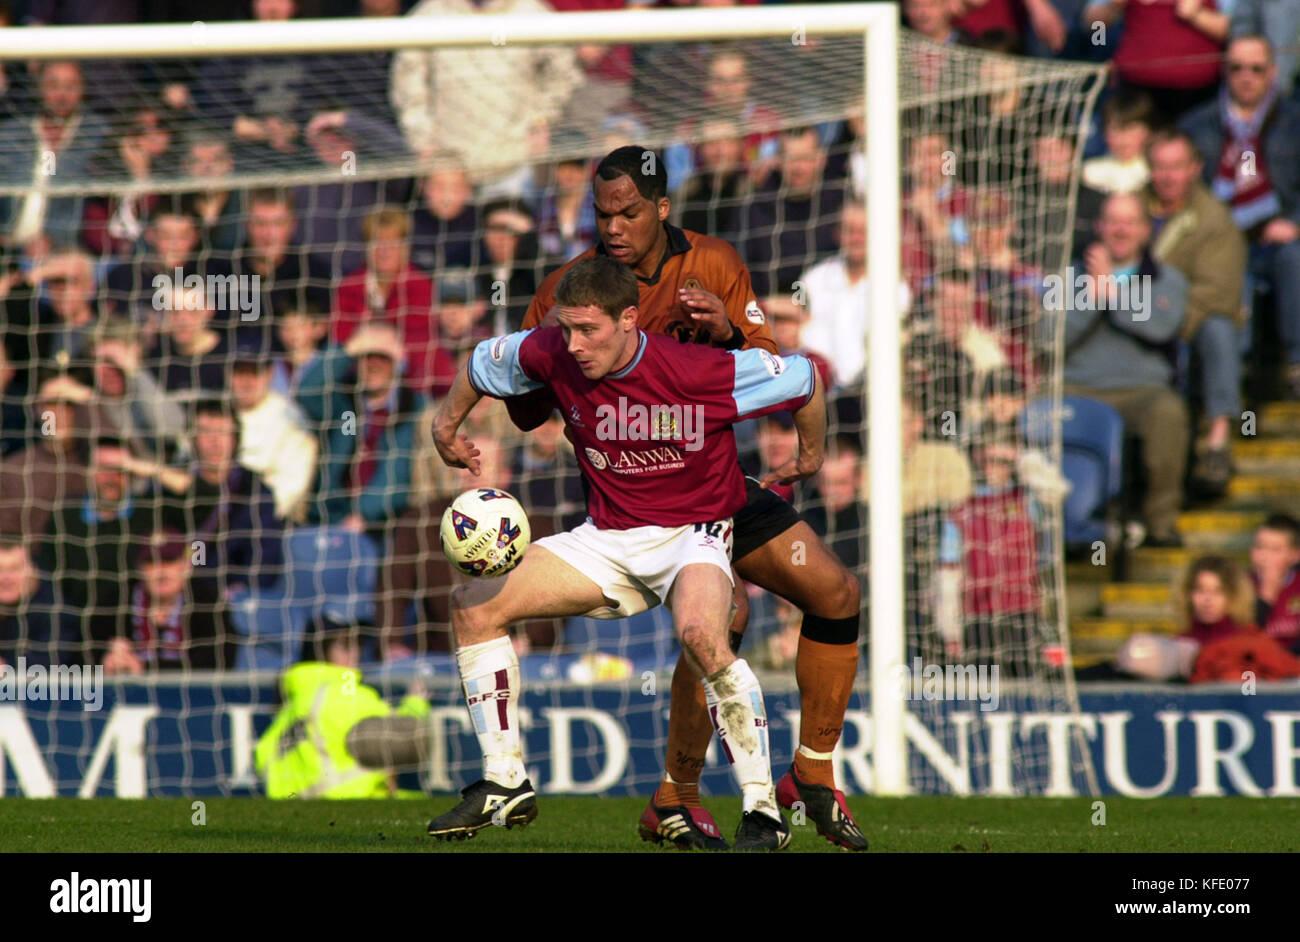 Footballer Alan Moore and Joleon Lescott Burnley v Wolverhampton Wanderers March 2002 - Stock Image